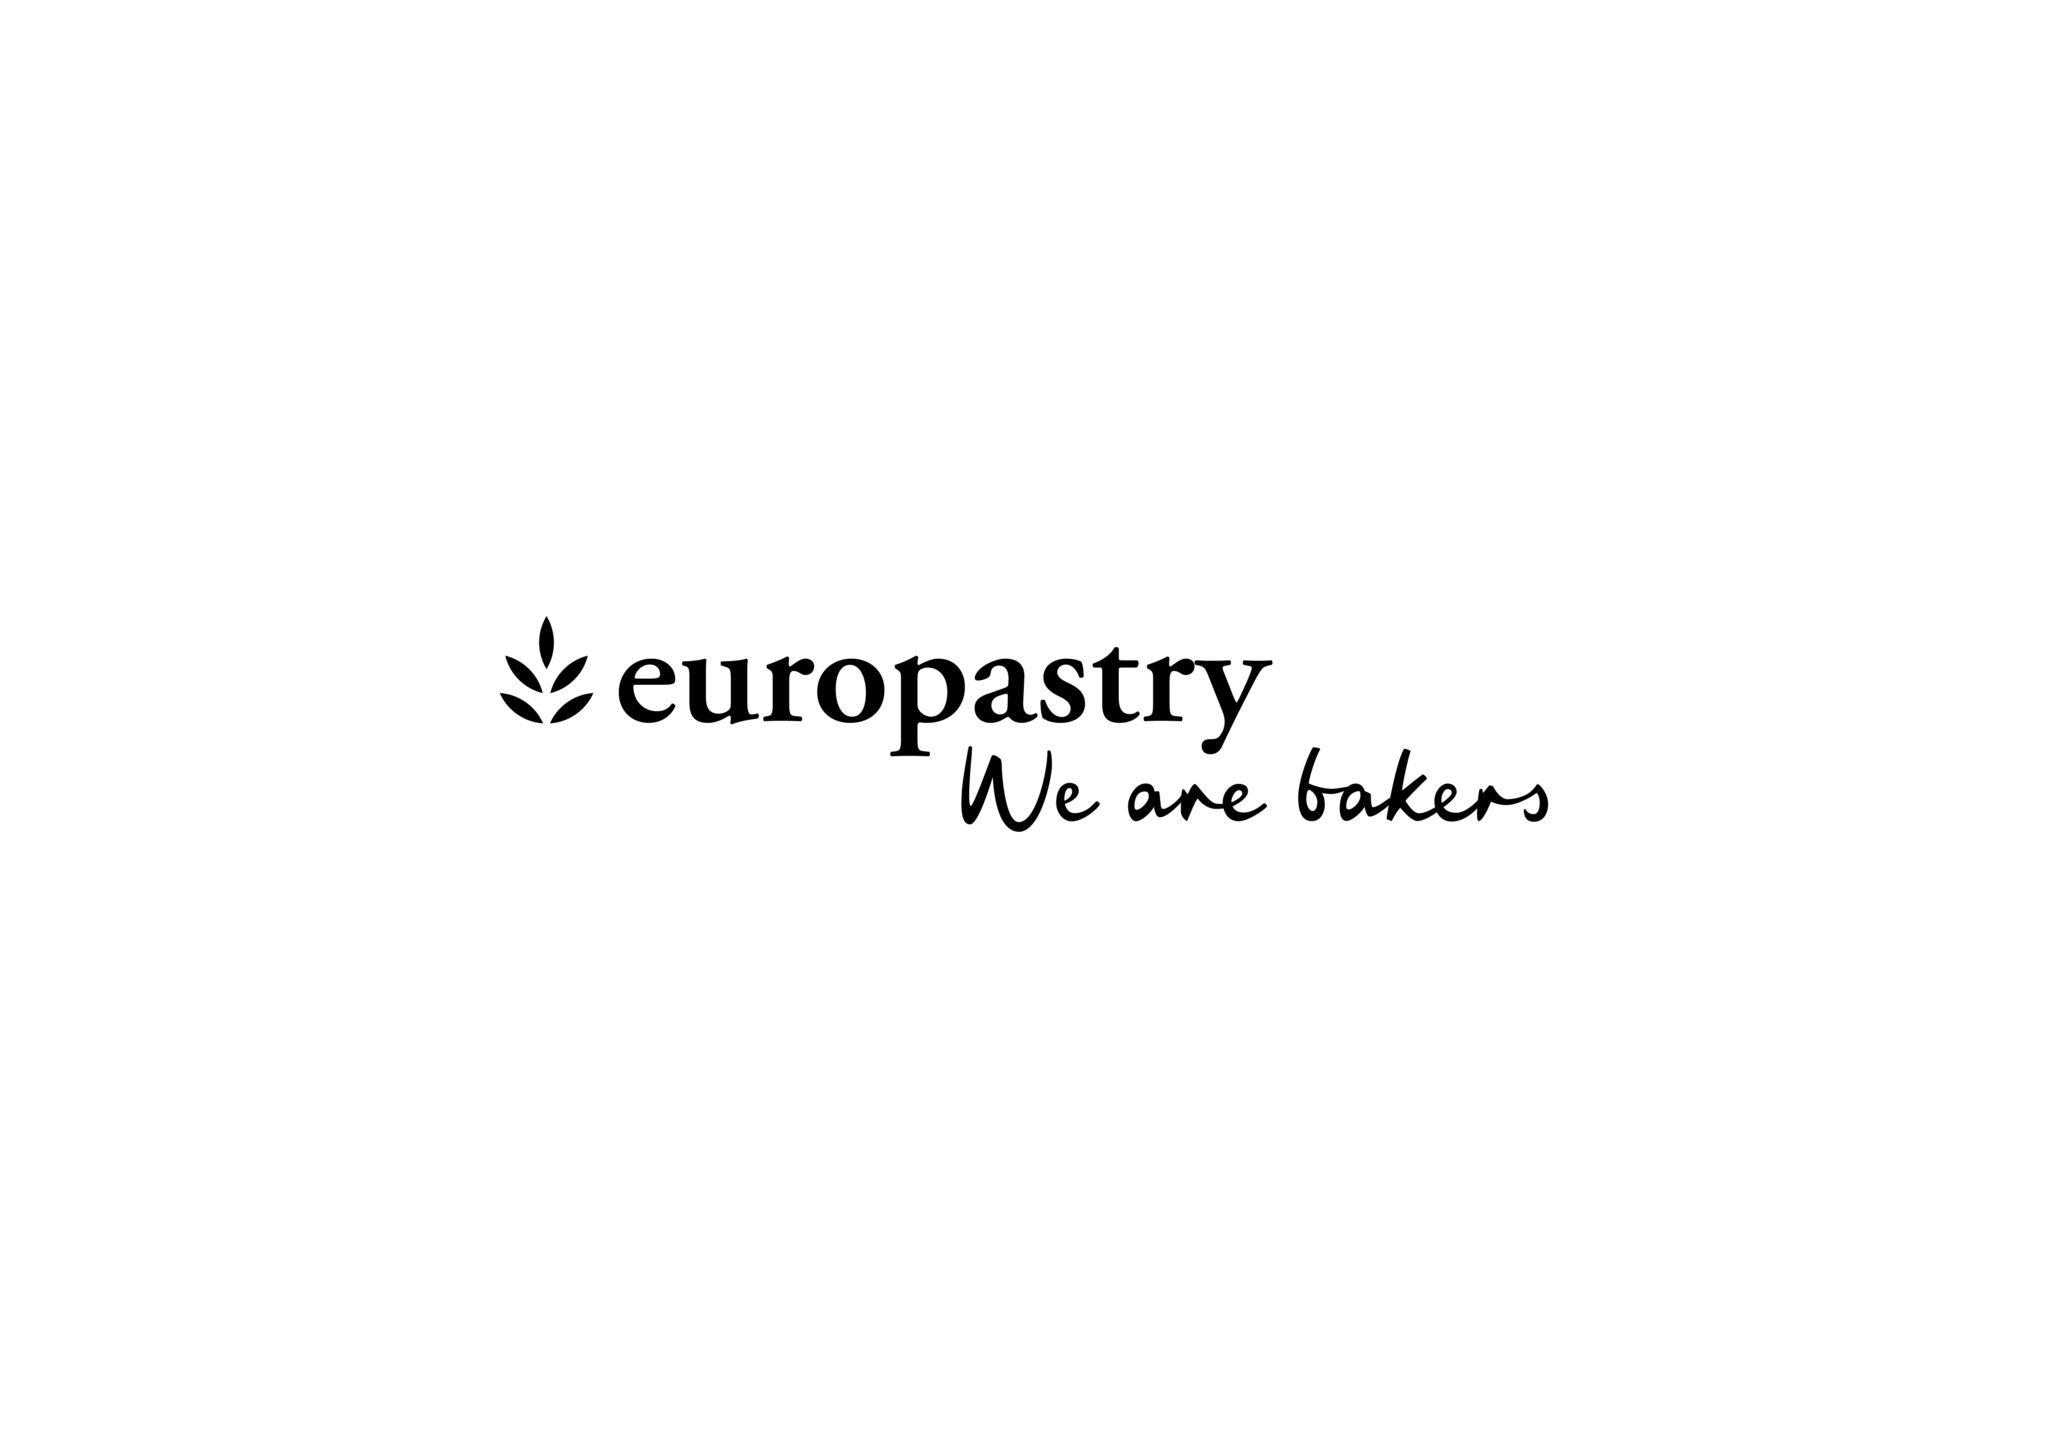 EP-logo-2020_logo claim 1 positivo